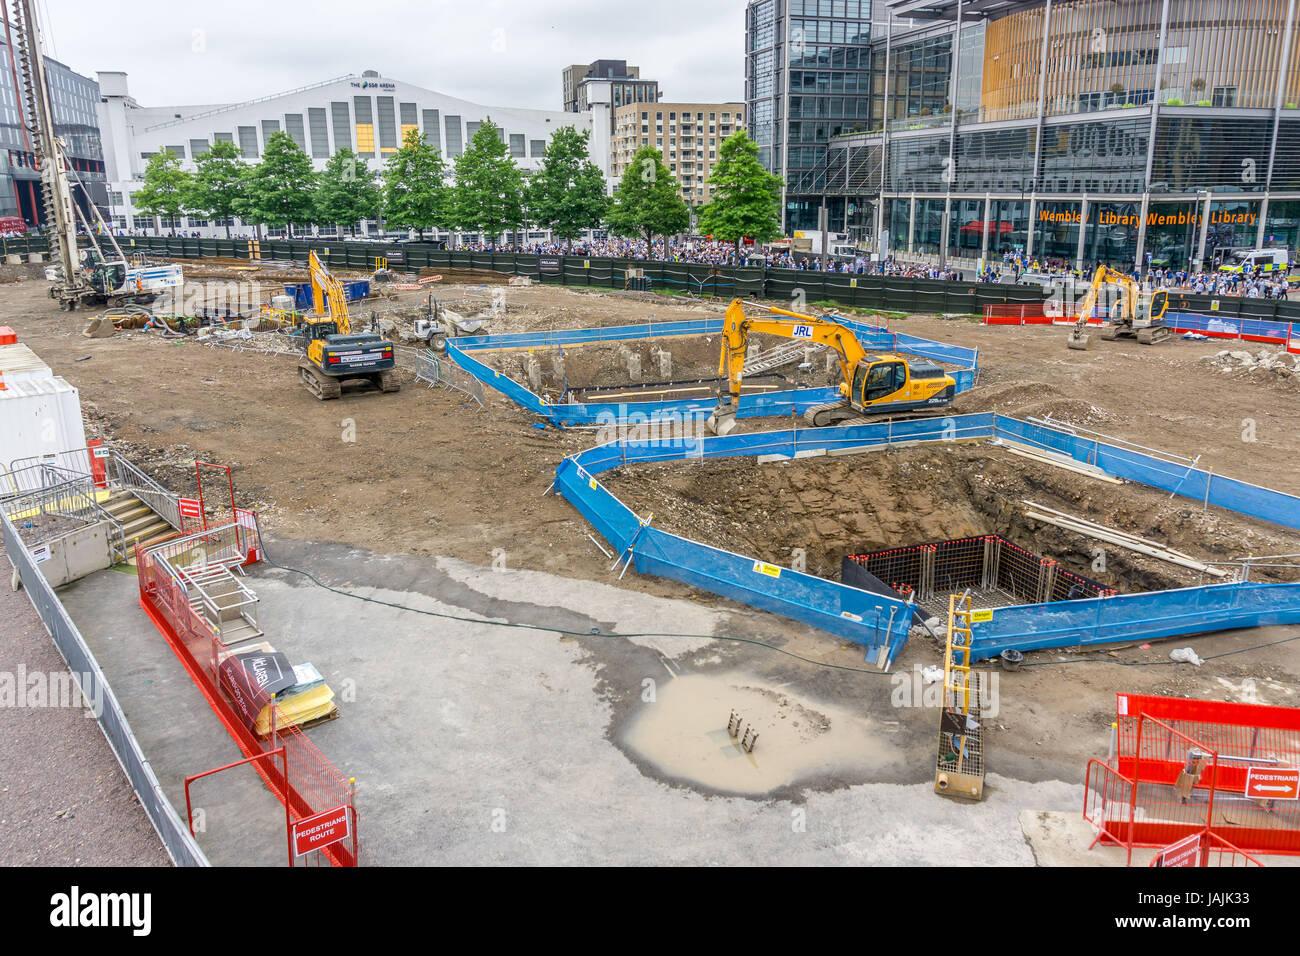 Contruction of Wembley Park, Wembley, London - Stock Image